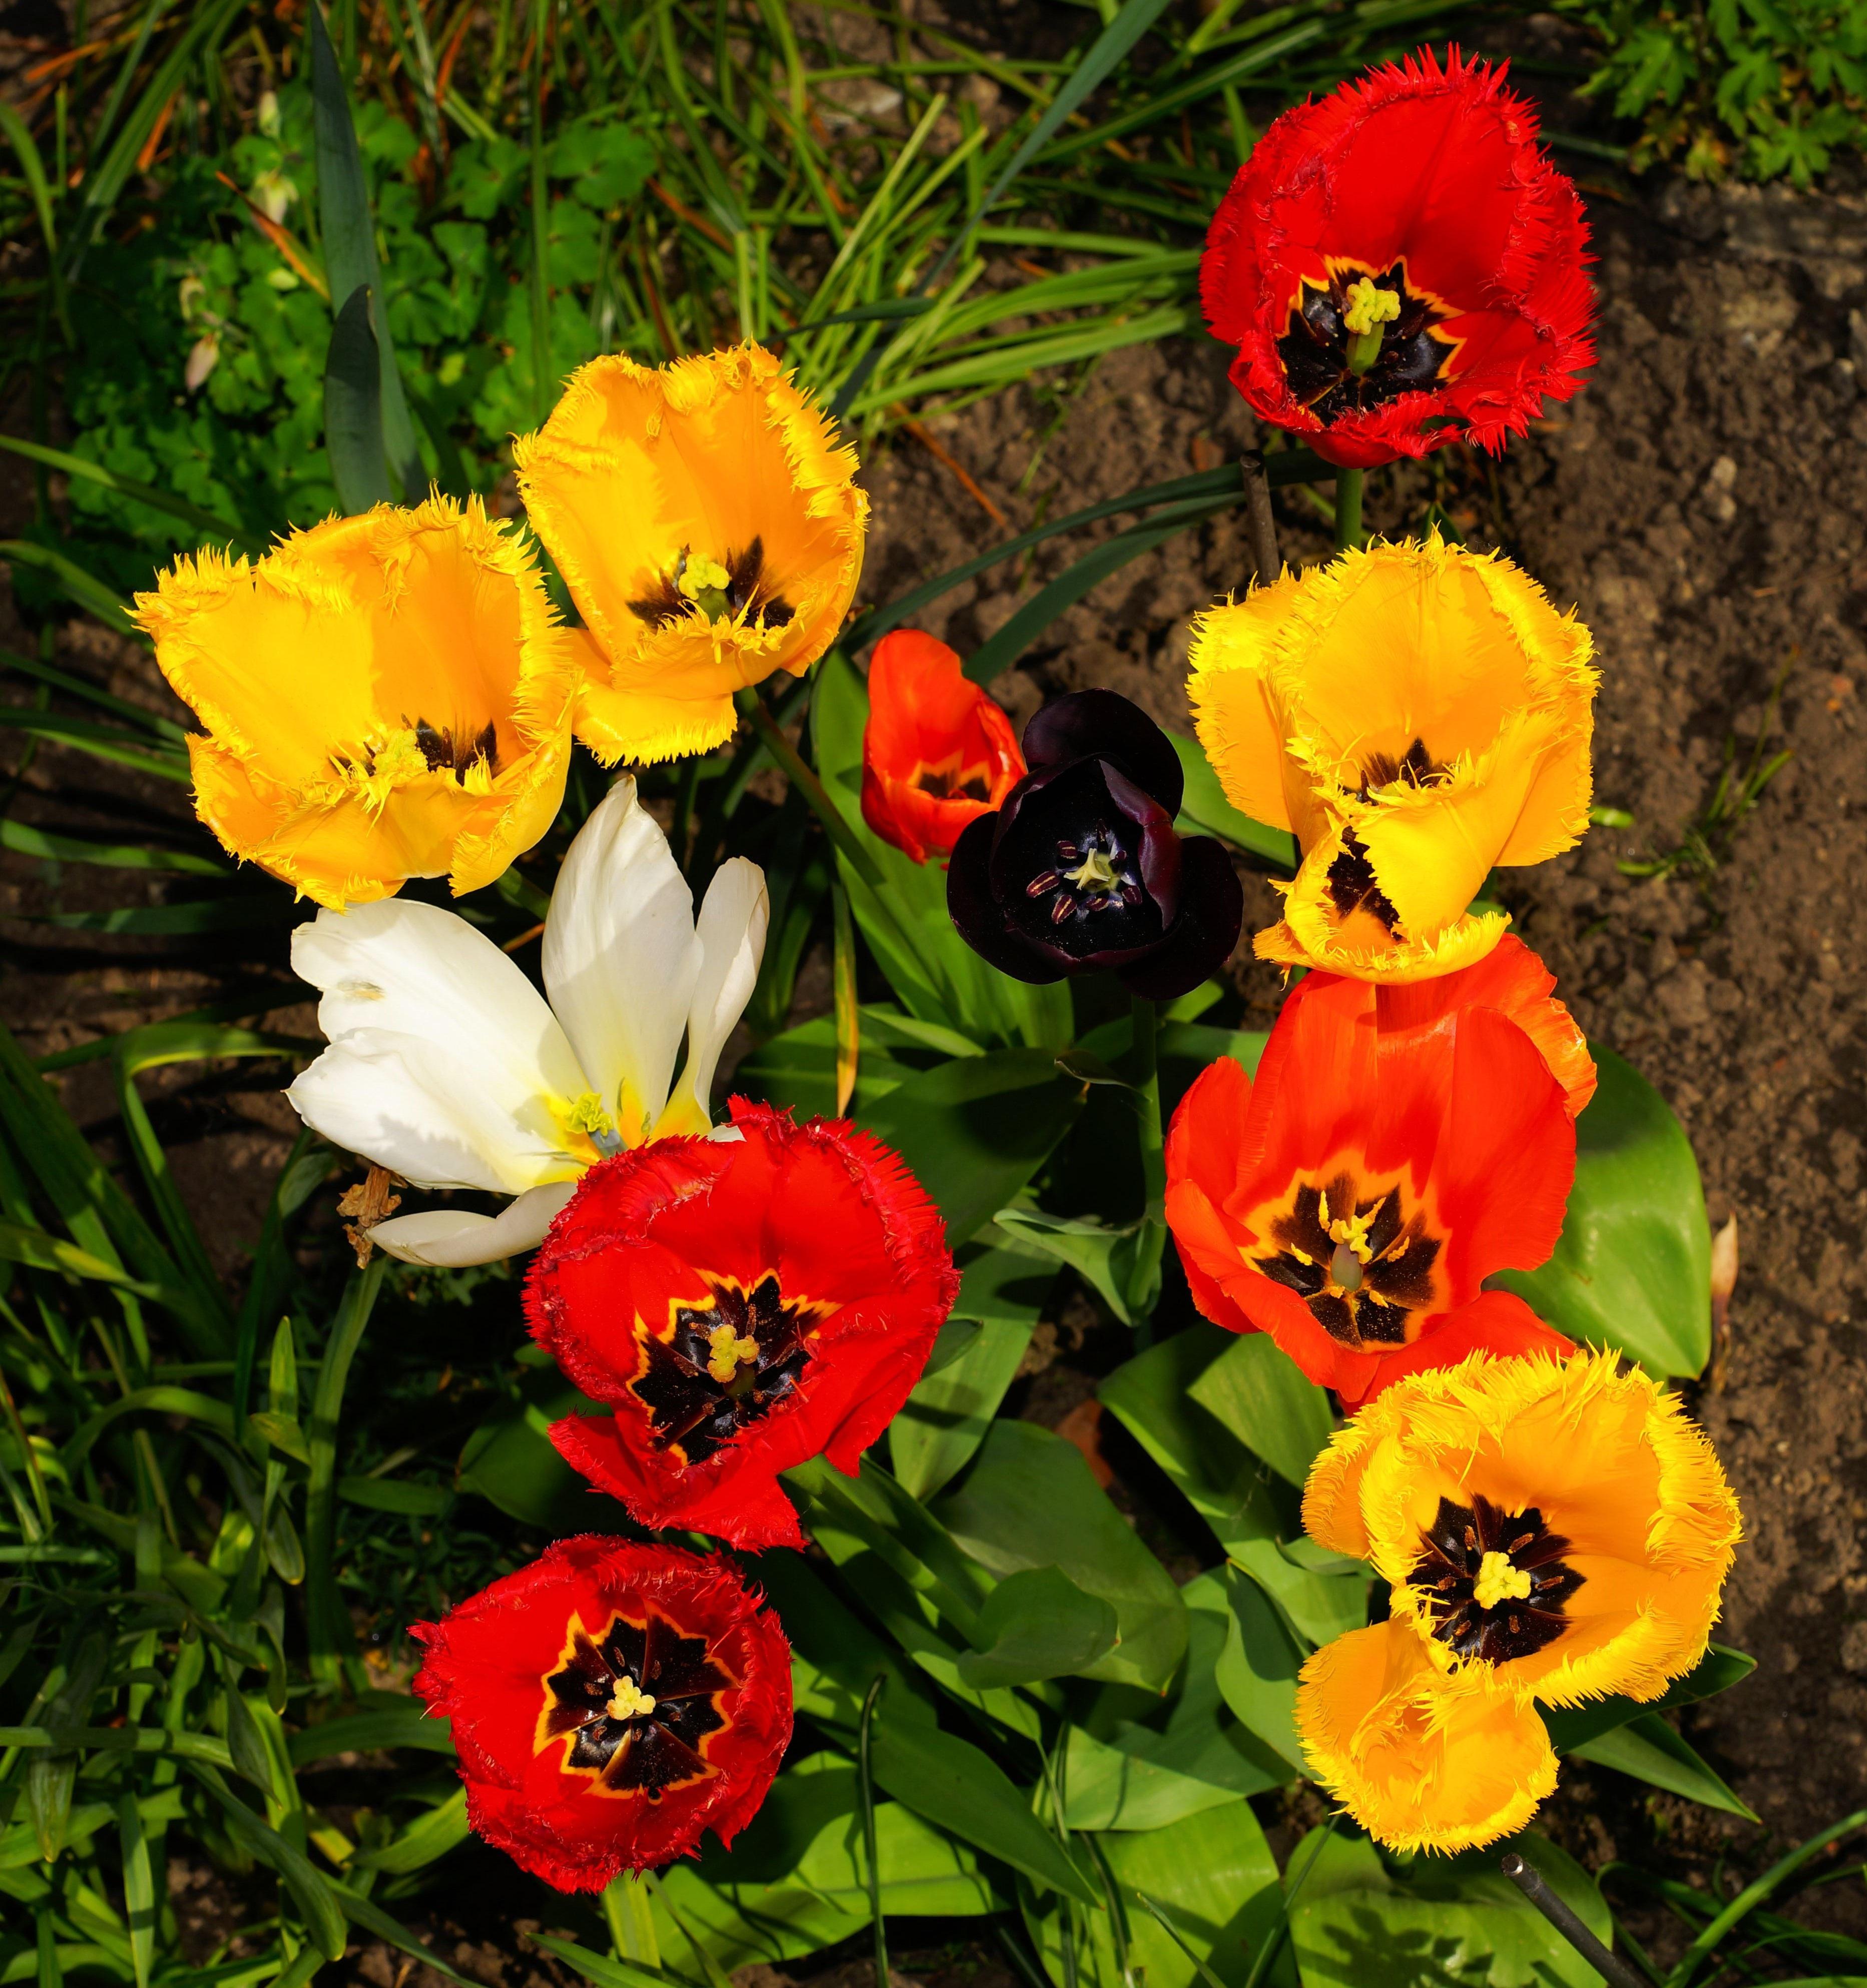 Free Images : nature, flower, decoration, spring, botany, colorful ...